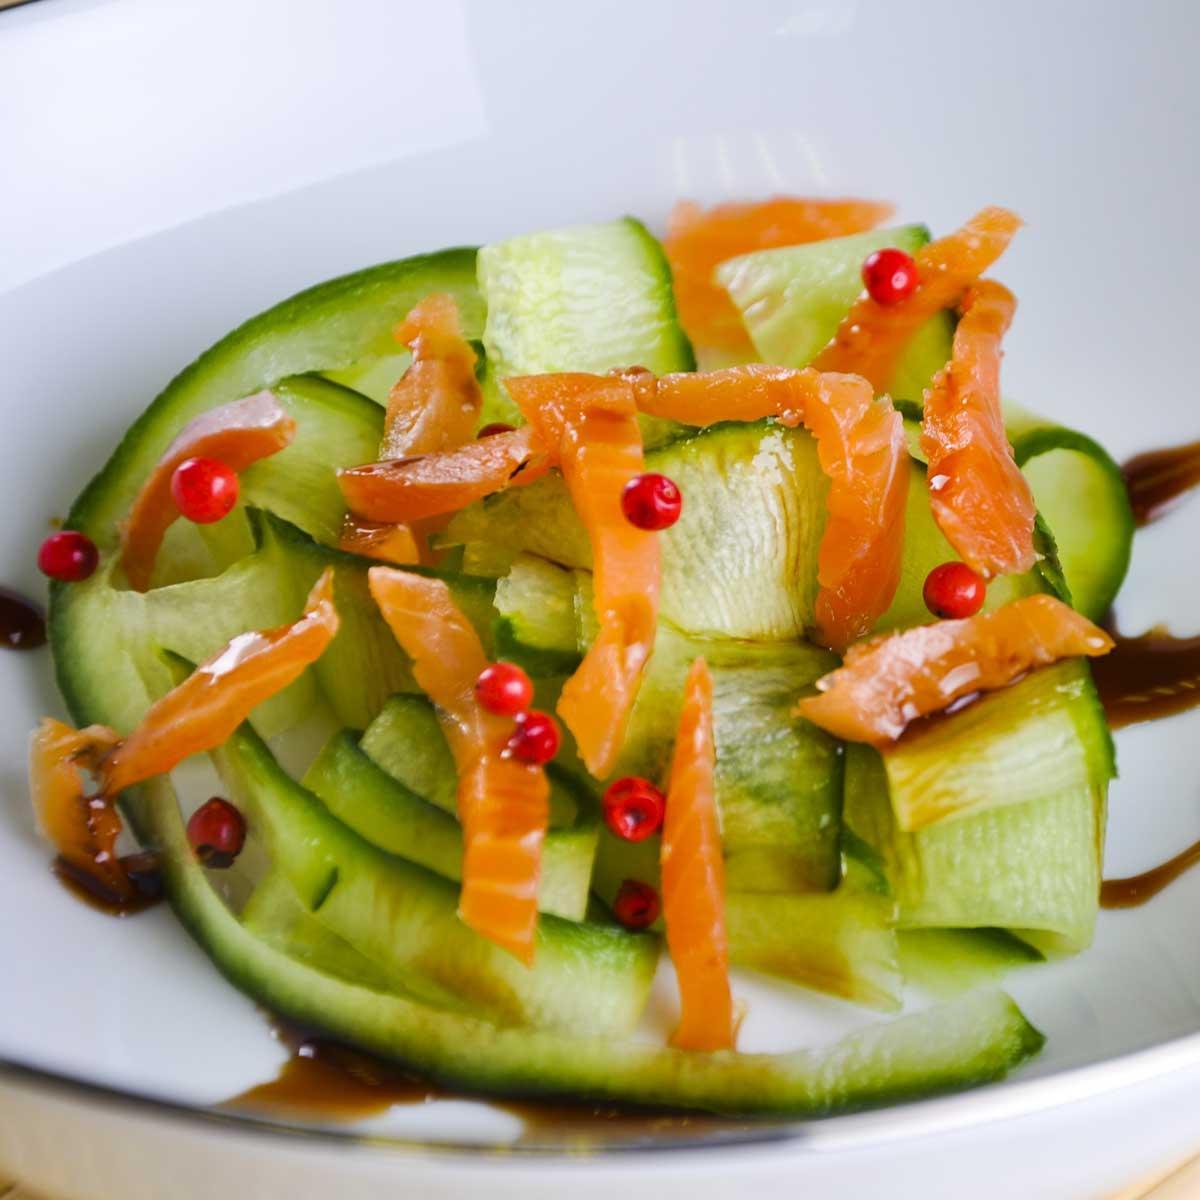 Recette salade de concombre au saumon fumé - Cuisine / Madame Figaro